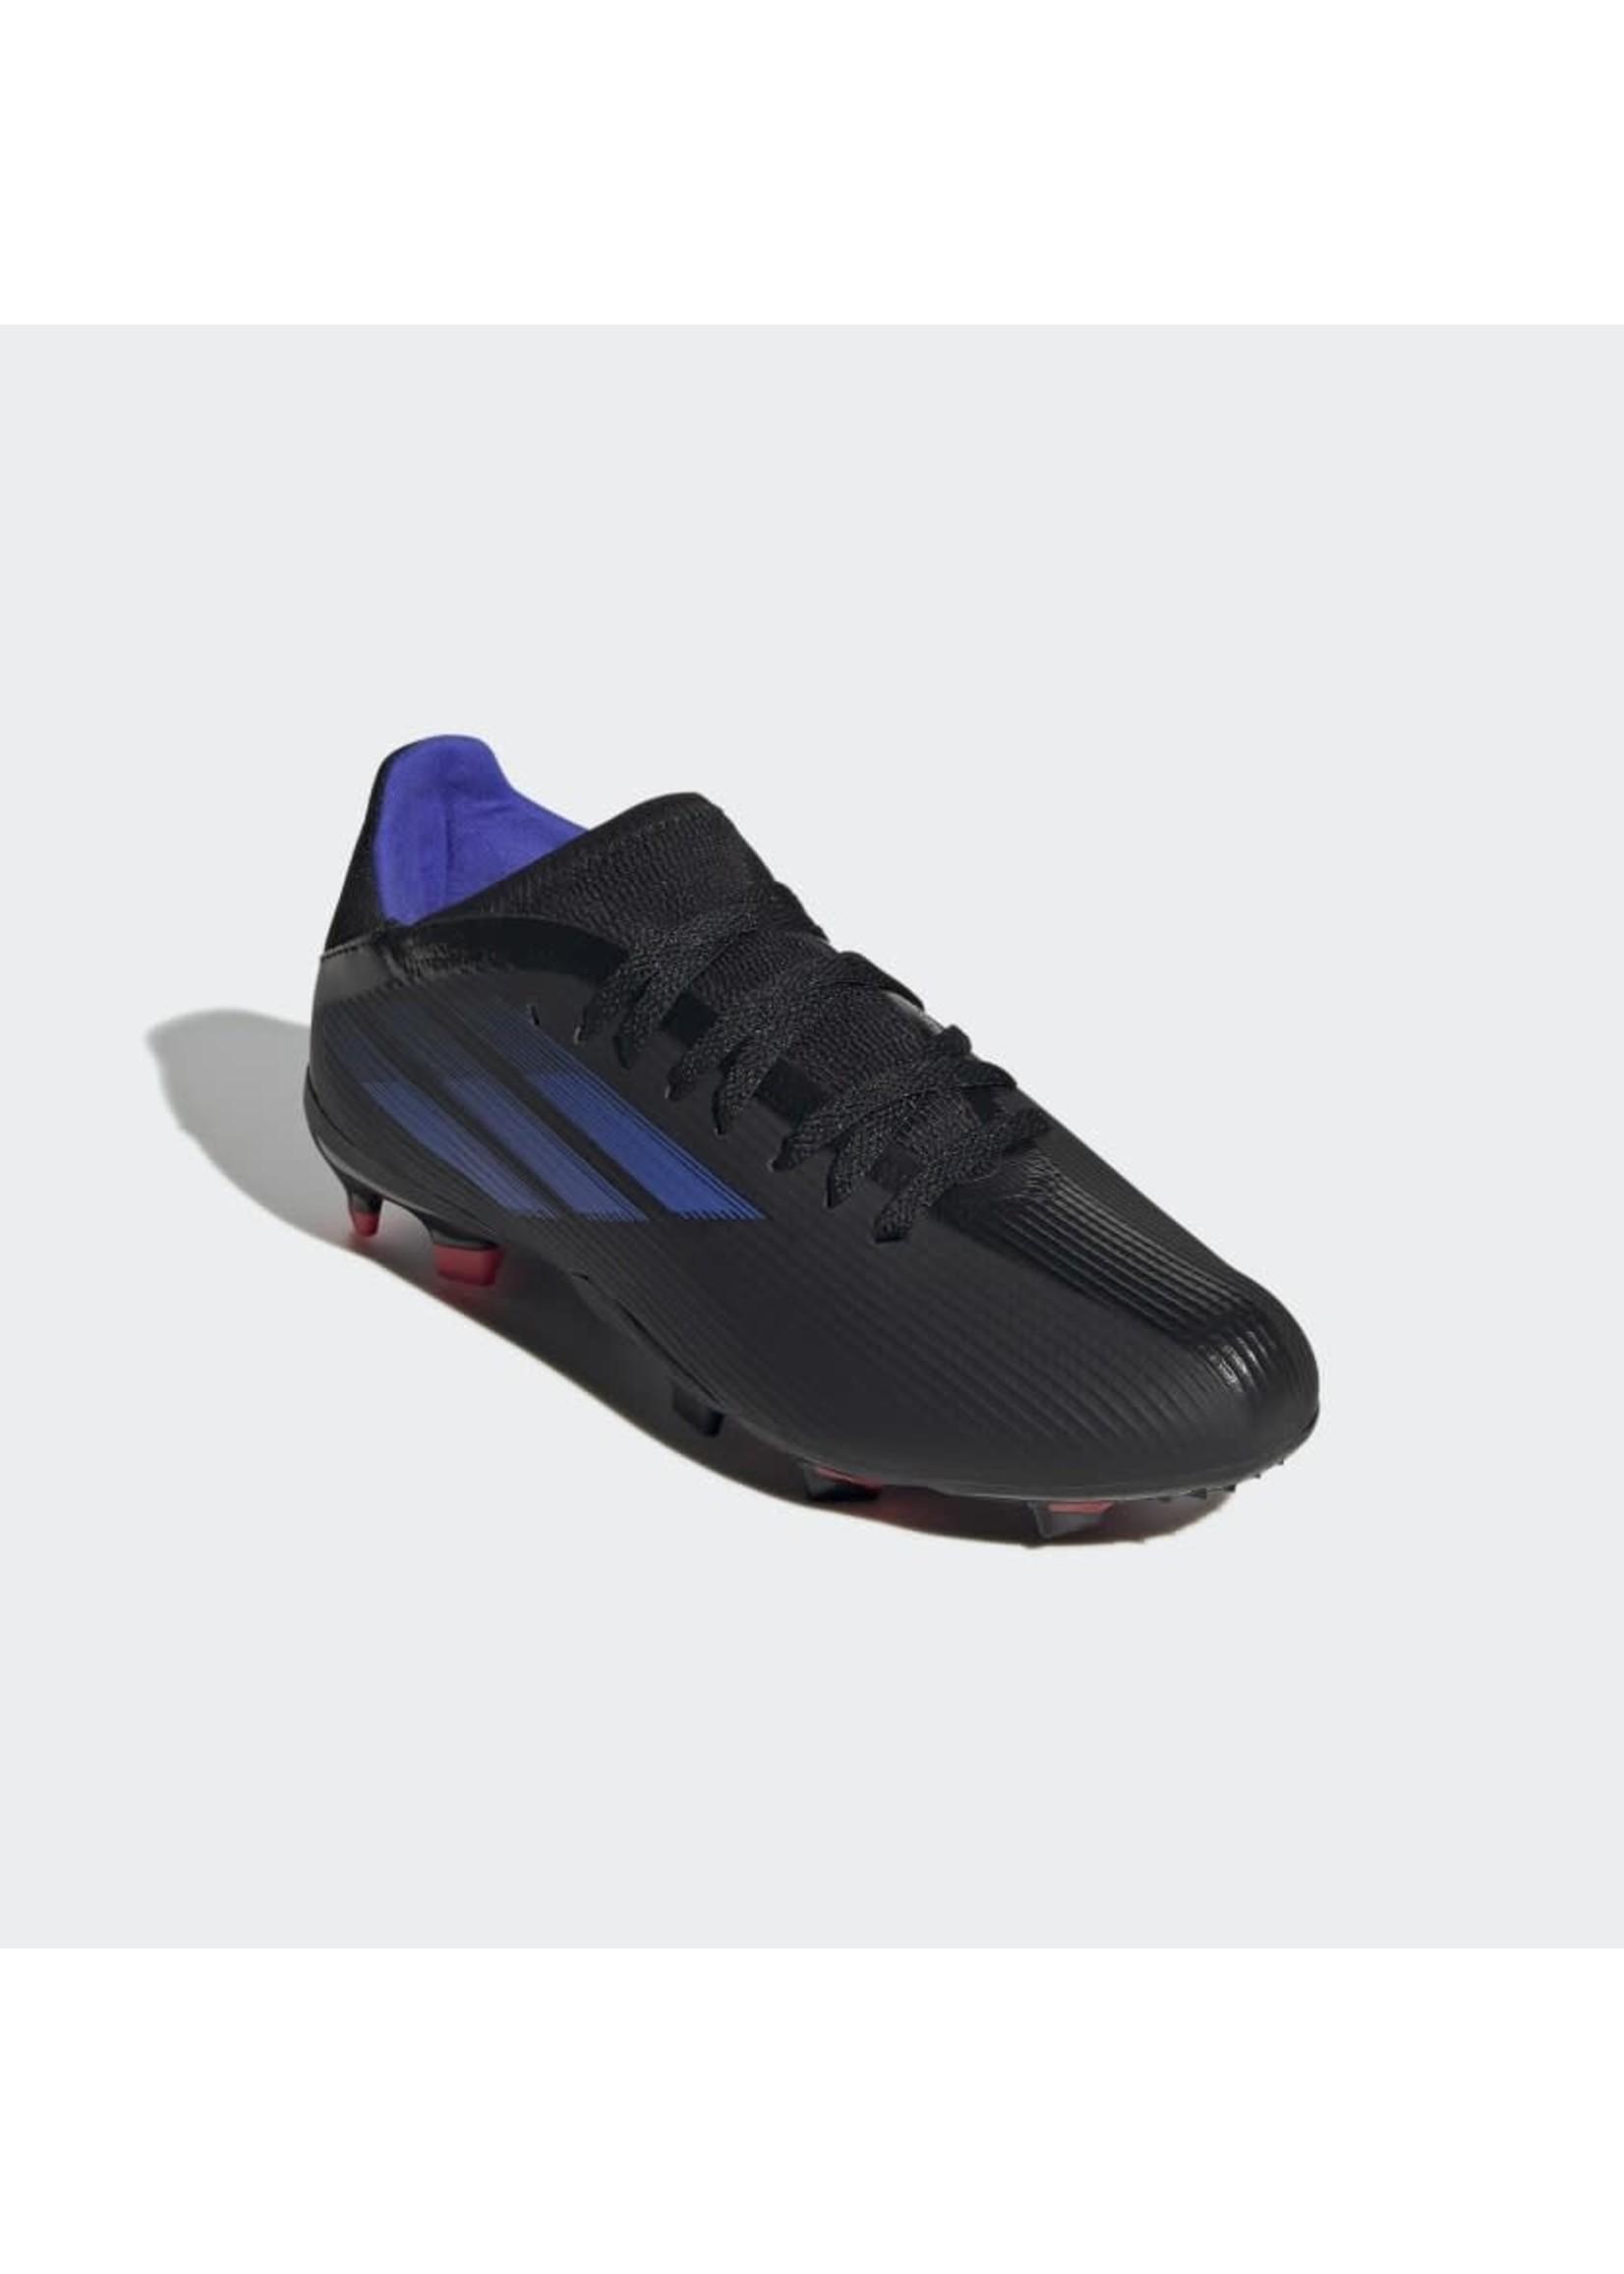 Adidas Adidas X Speedflow 3 Junior Football Boots - FG (2021)